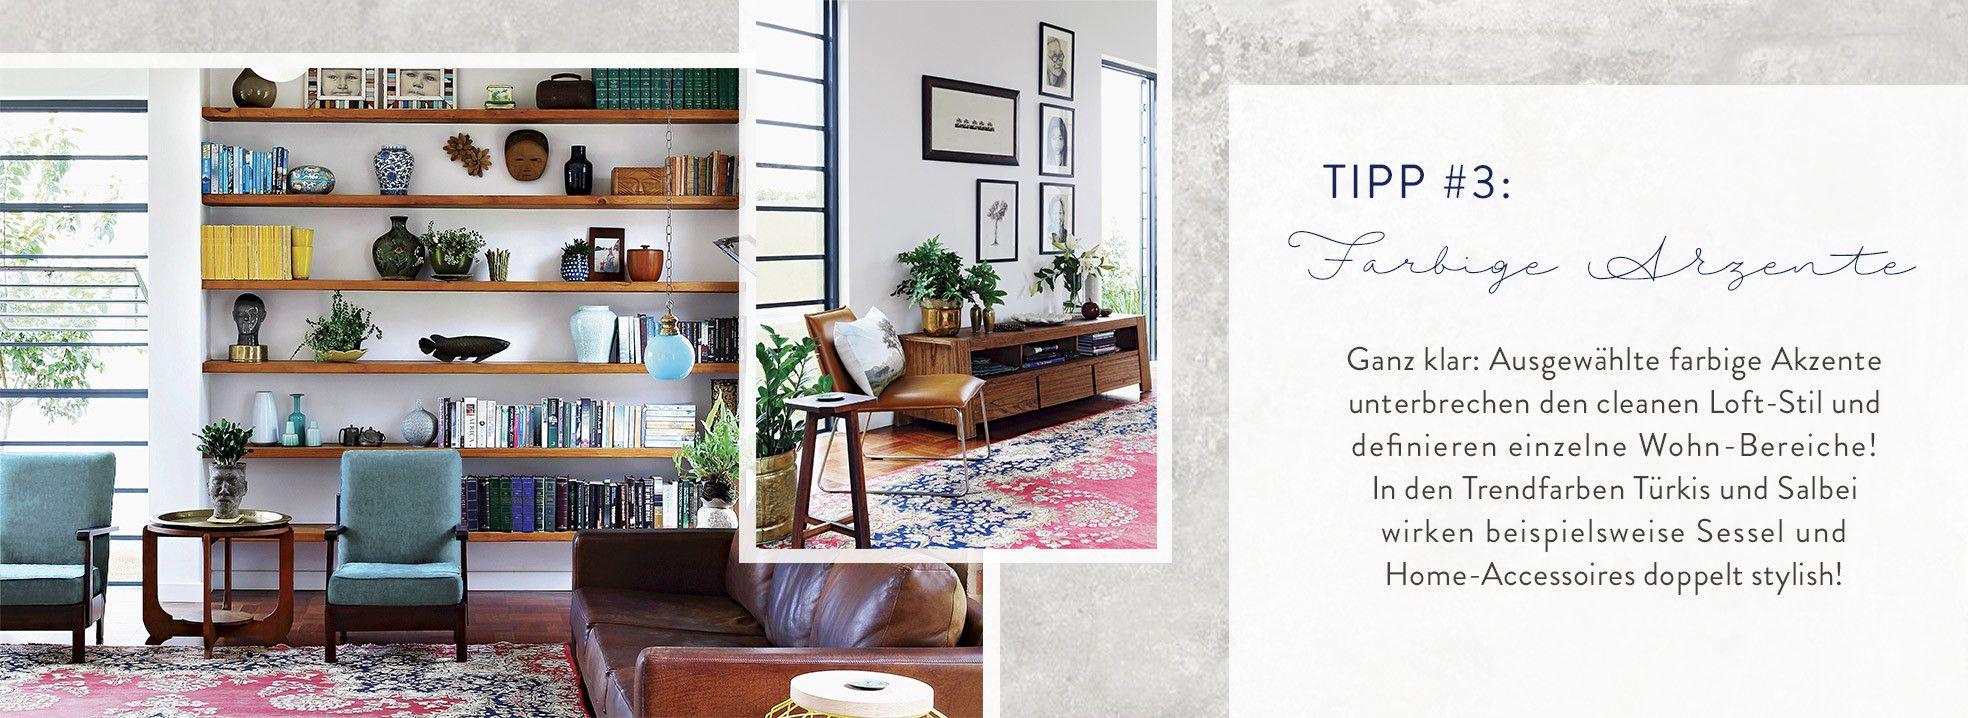 Modern Loft-Style | Sale bei Westwing | Living | Pinterest | Einrichtung